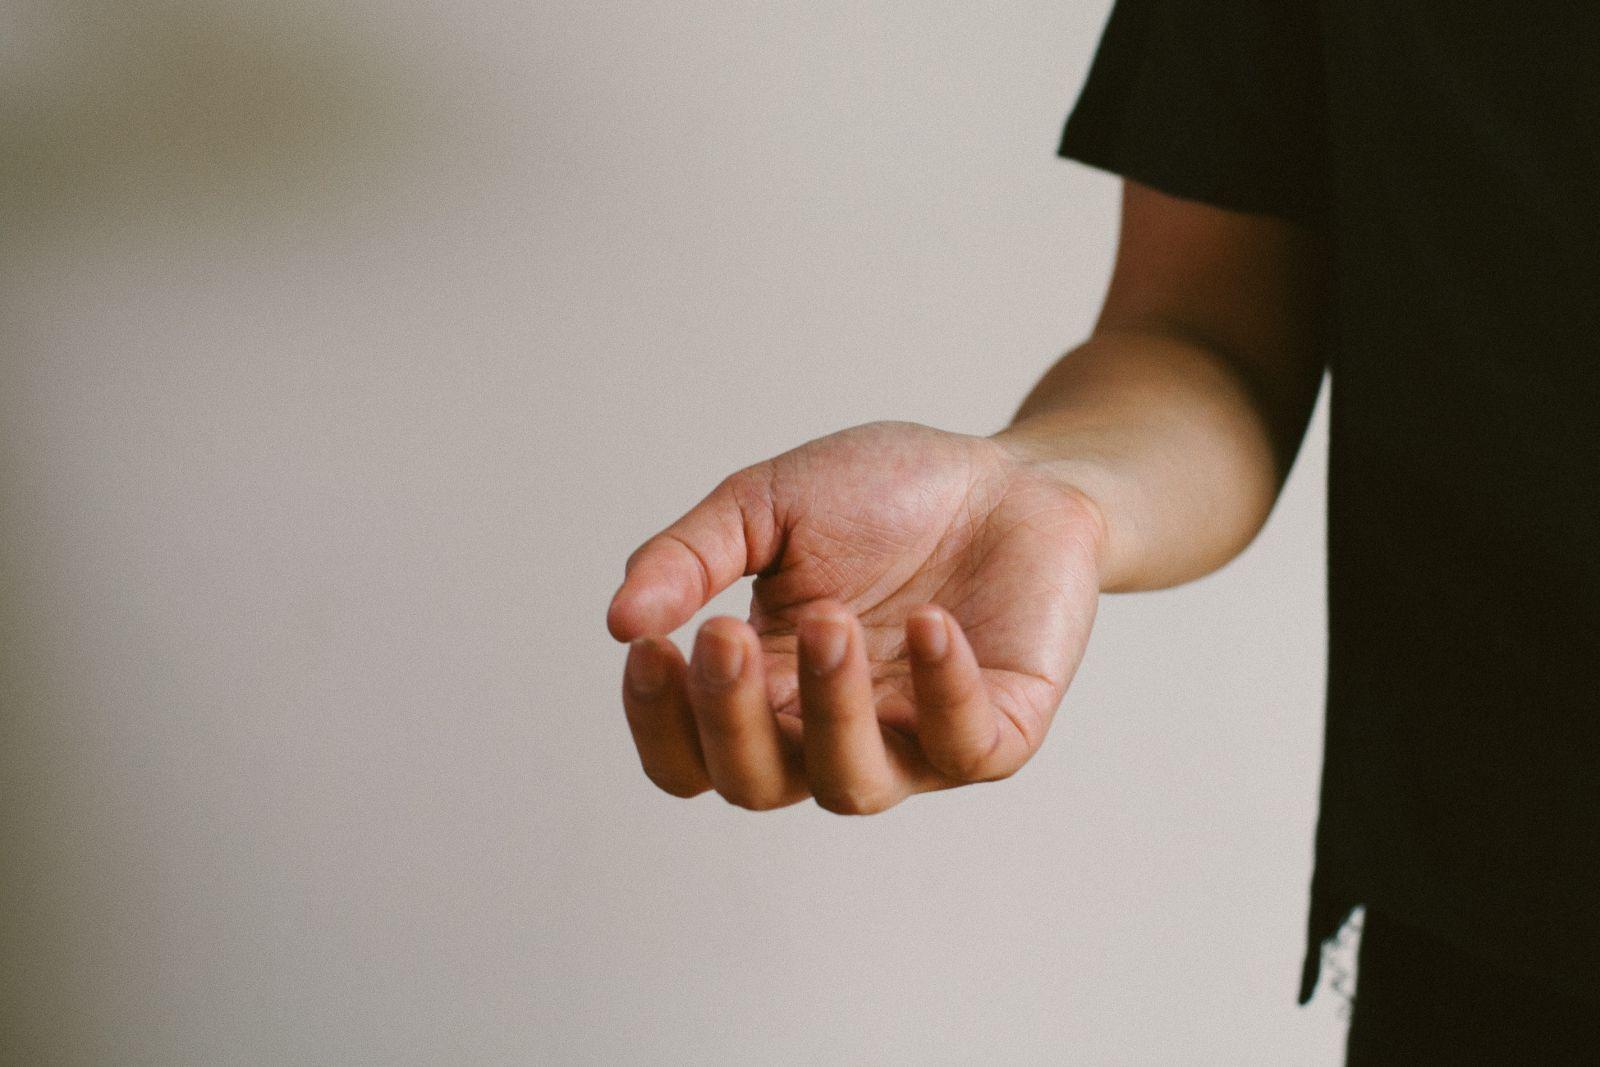 https://d2ebzu6go672f3.cloudfront.net/media/content/images/Mans-hand-wrist-pain-palm-fingers-Death_to_Stock_Photography_BodyTruths_2.jpg